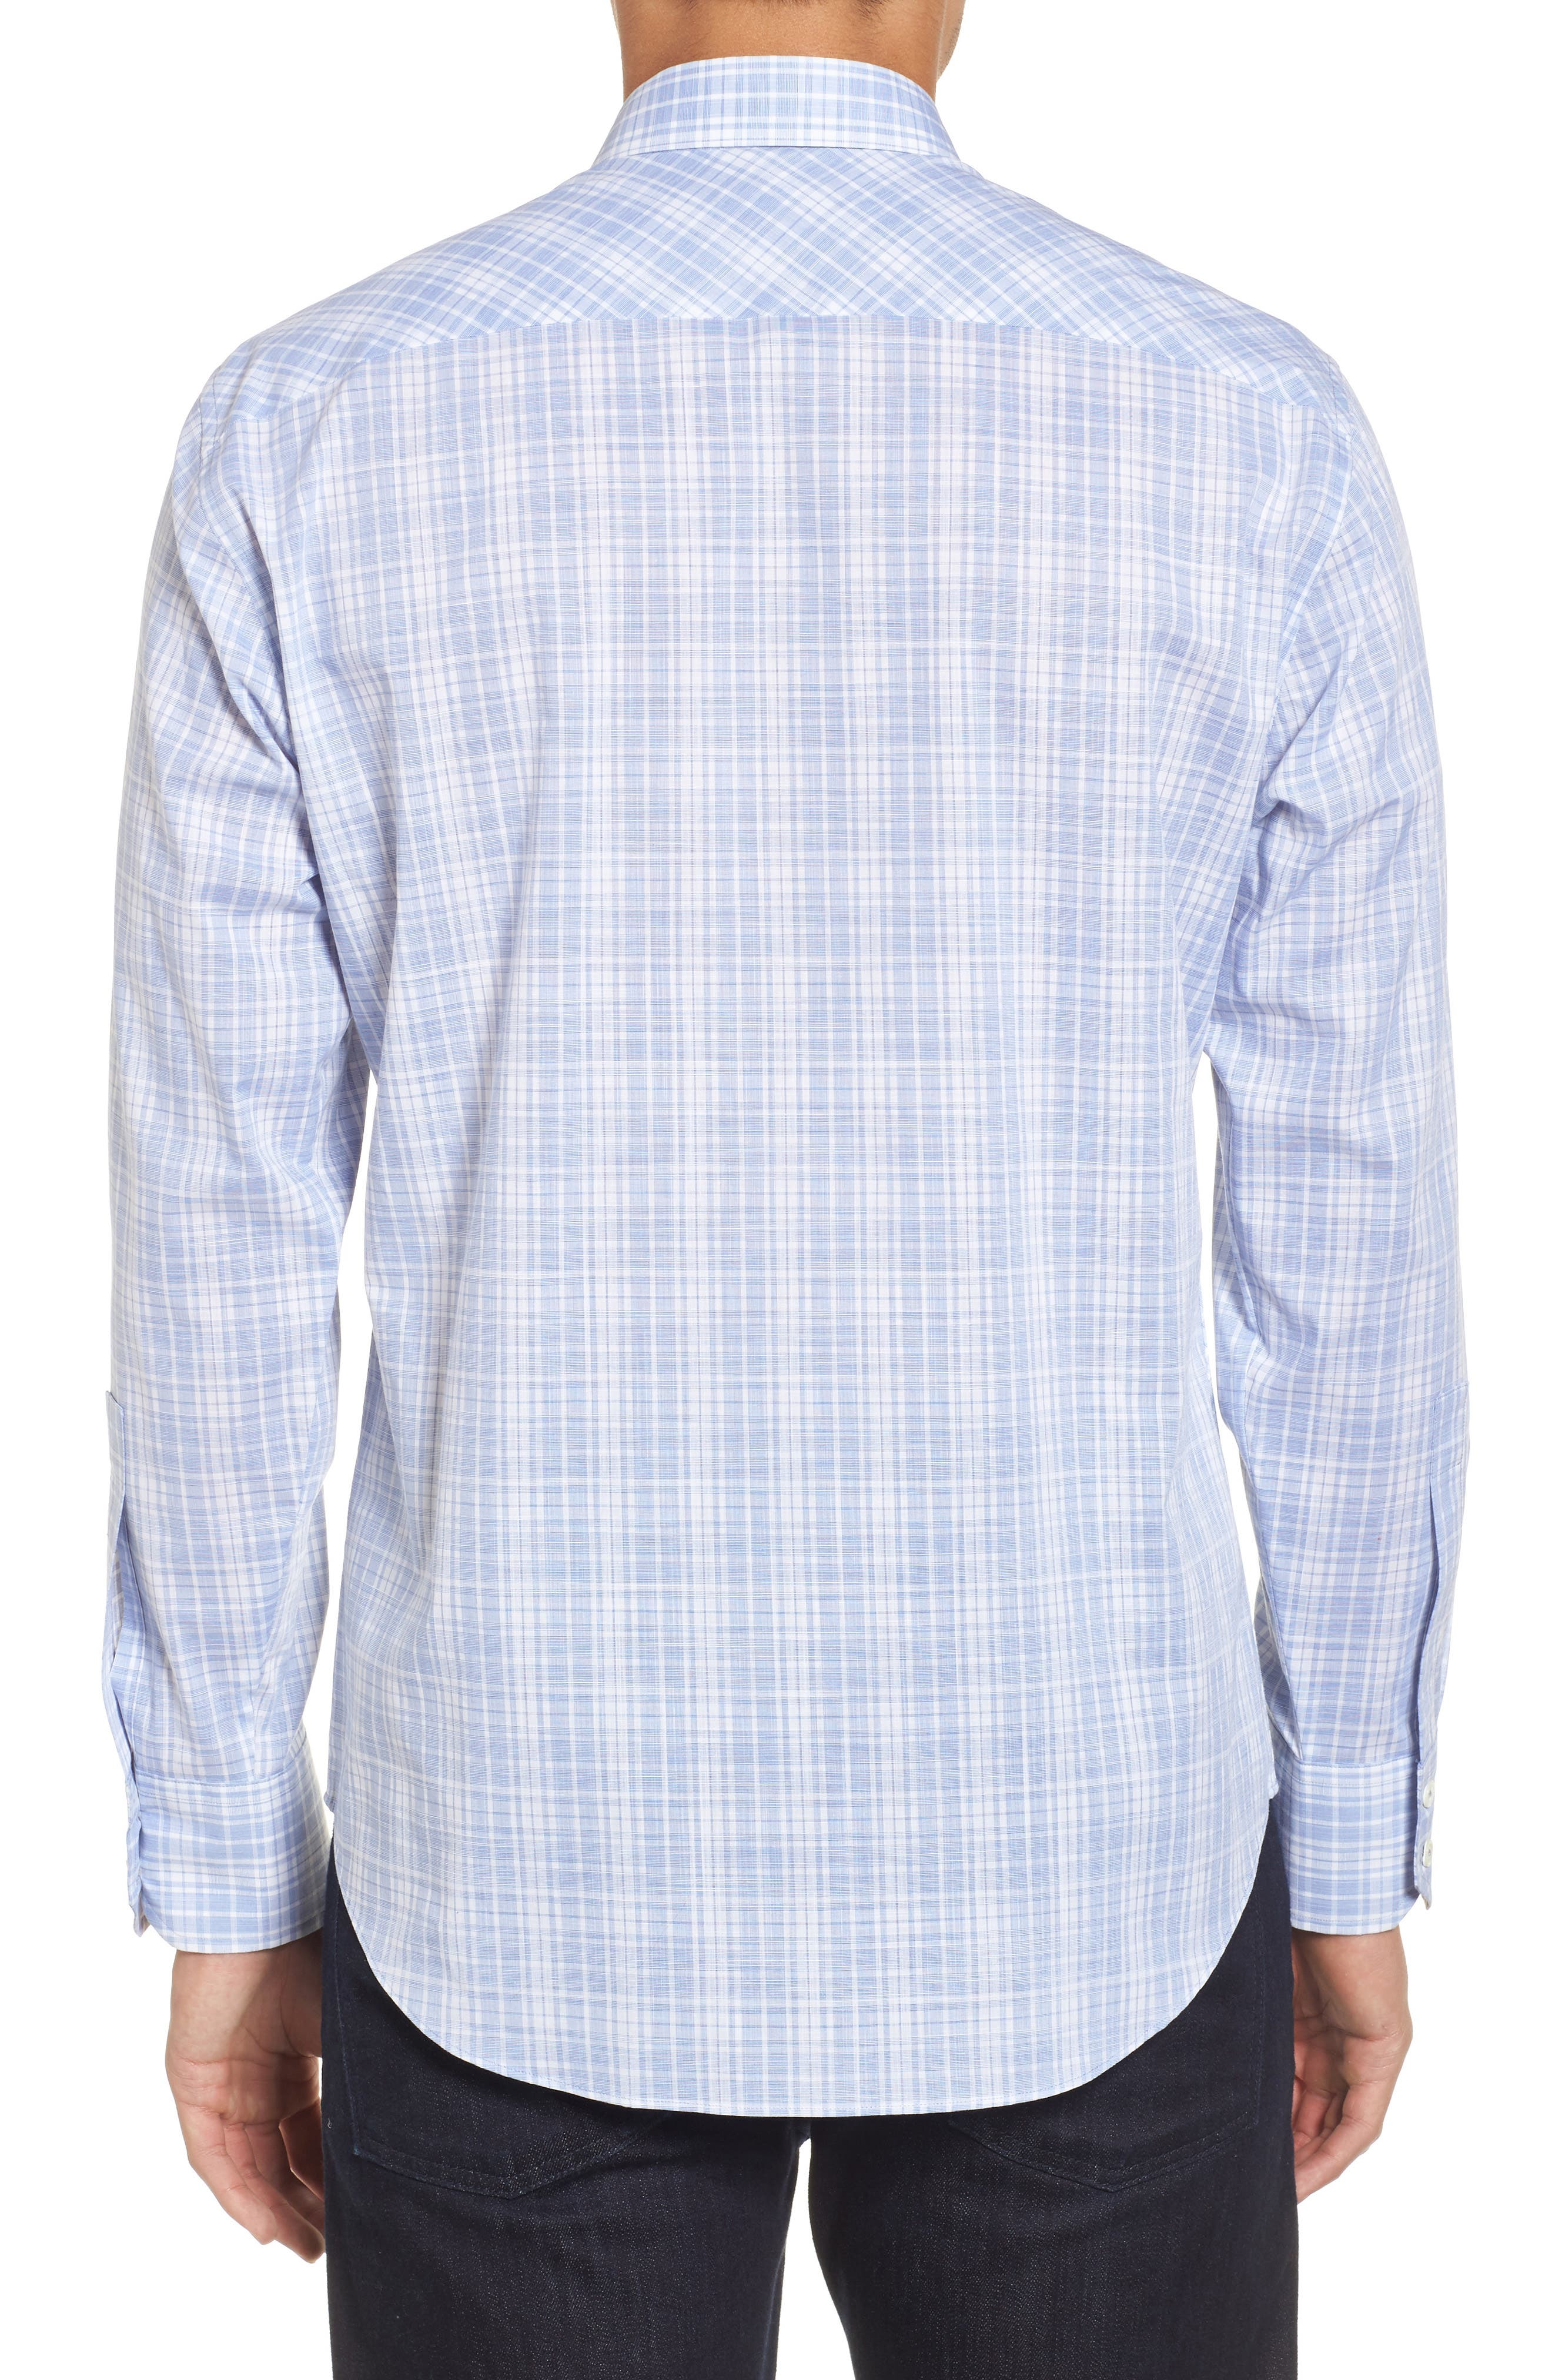 Cochran Slim Fit Plaid Sport Shirt,                             Alternate thumbnail 2, color,                             Blue